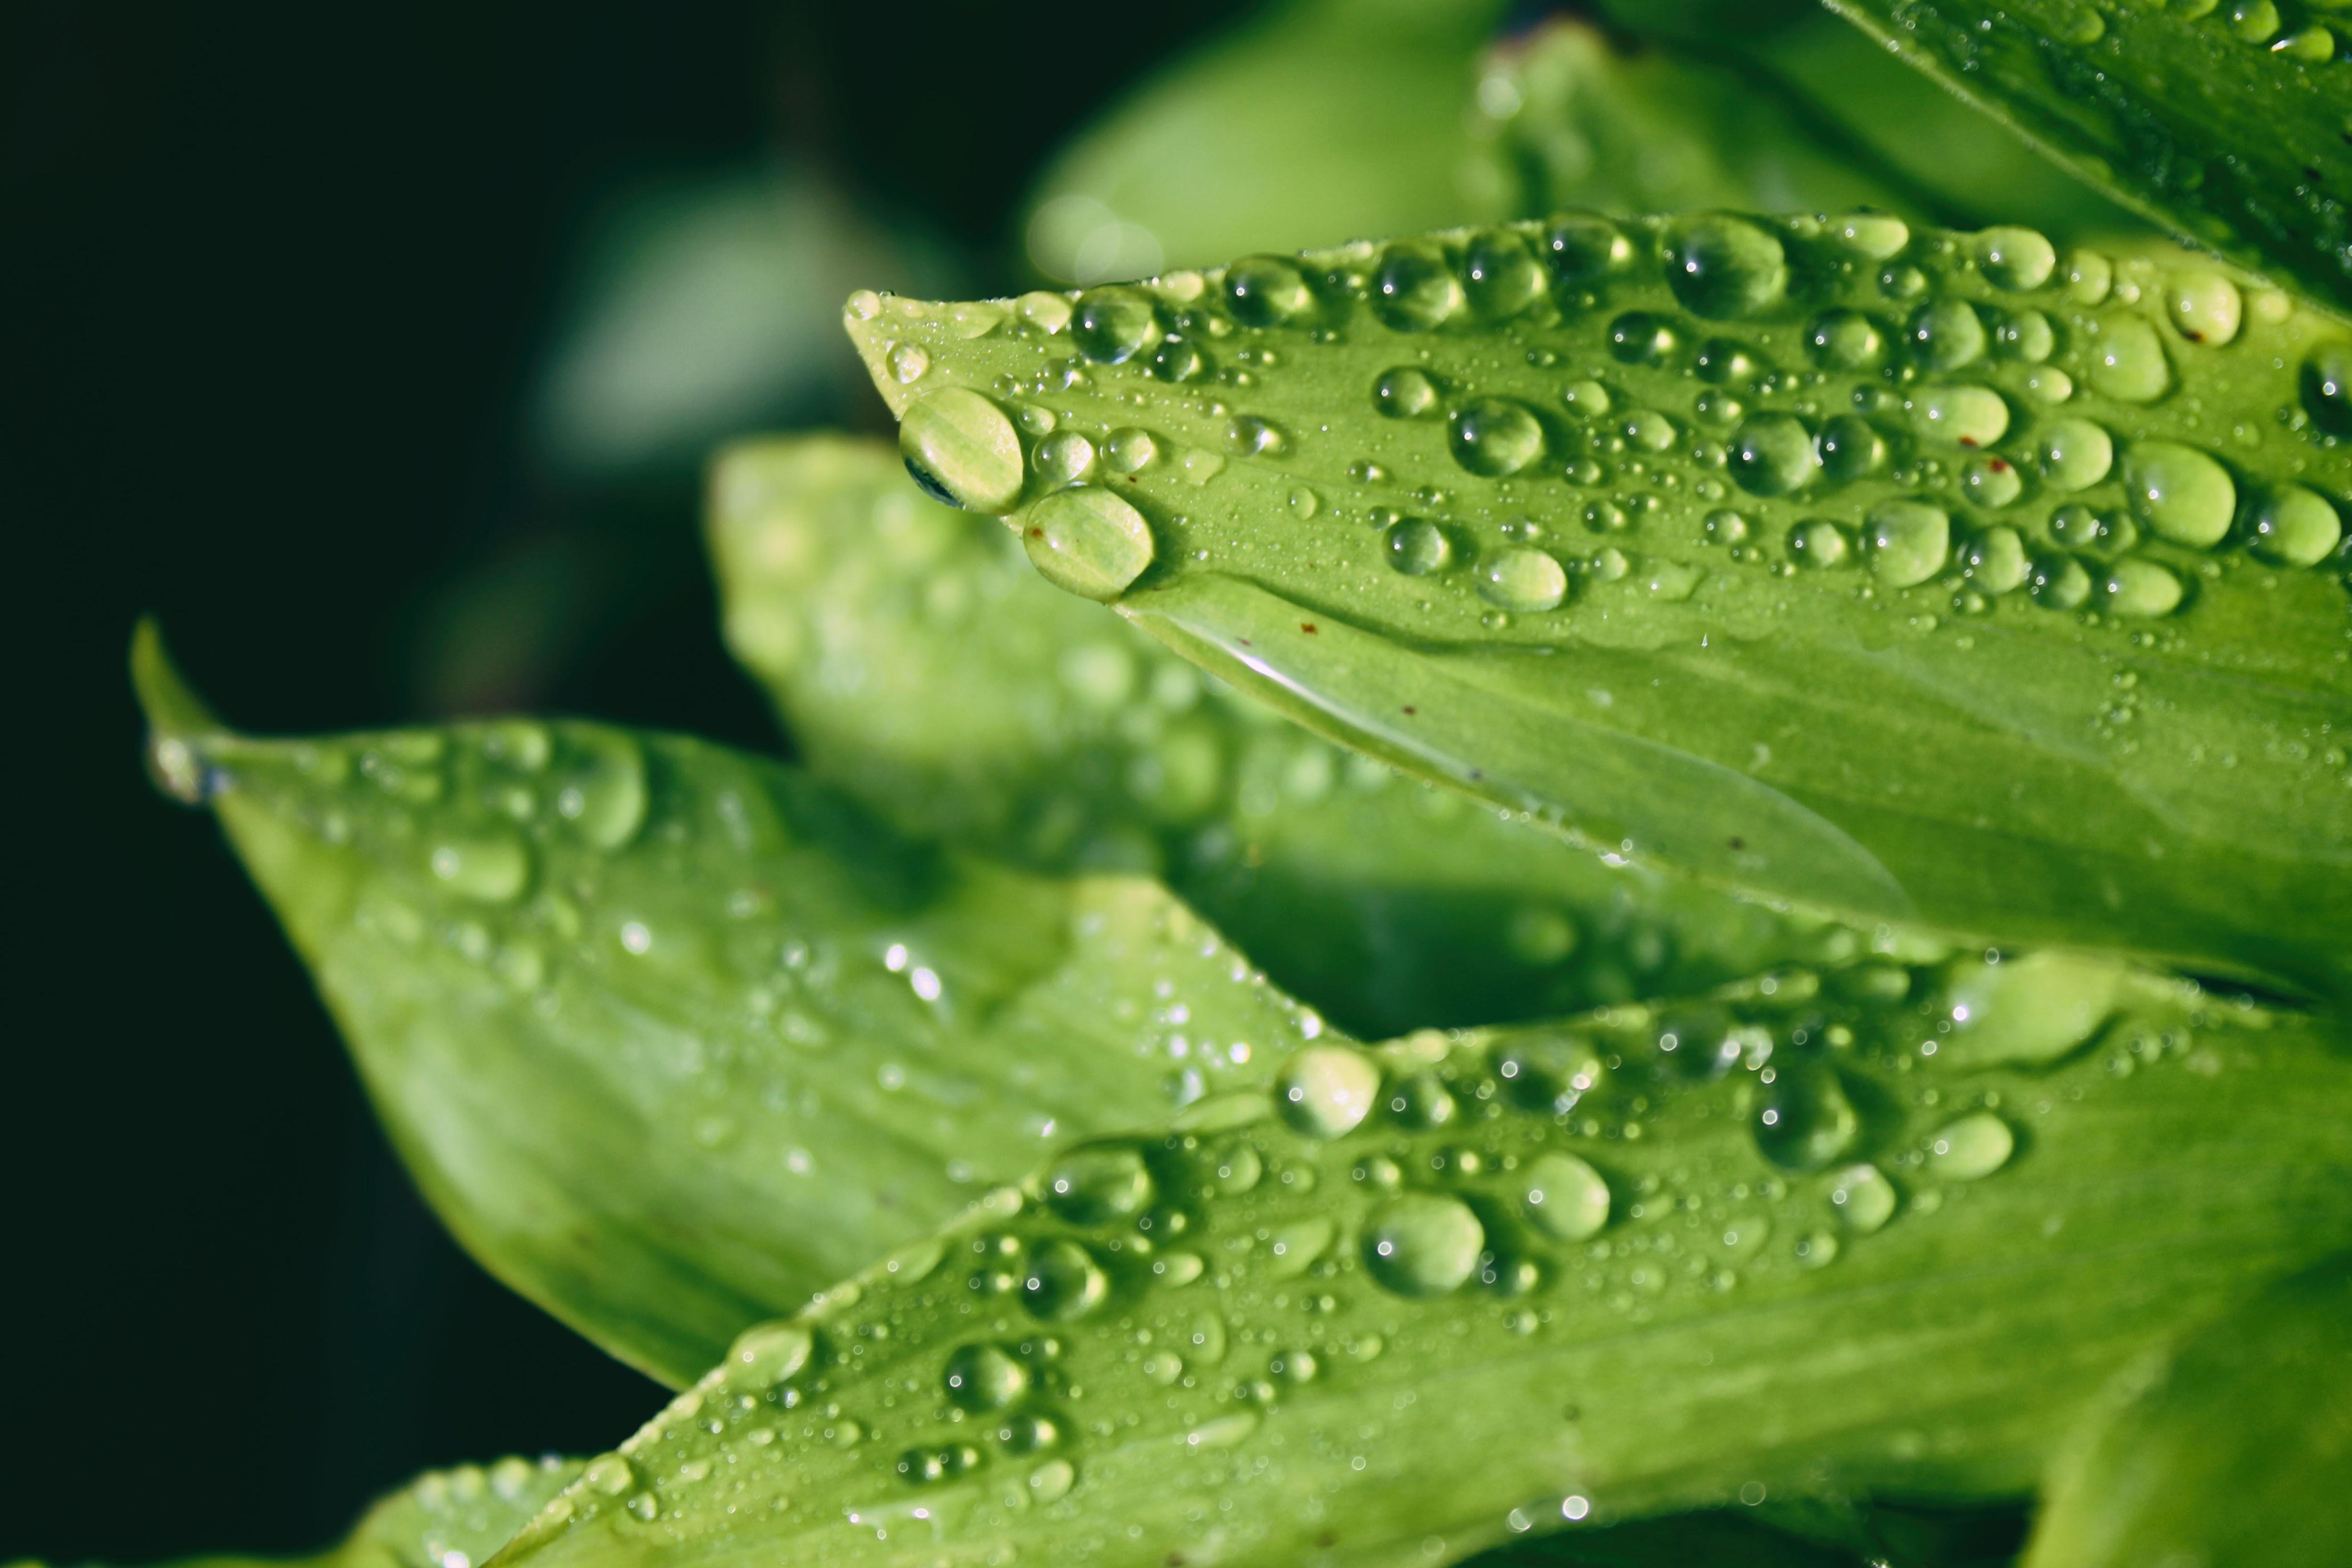 macro shot of droplets on leaves